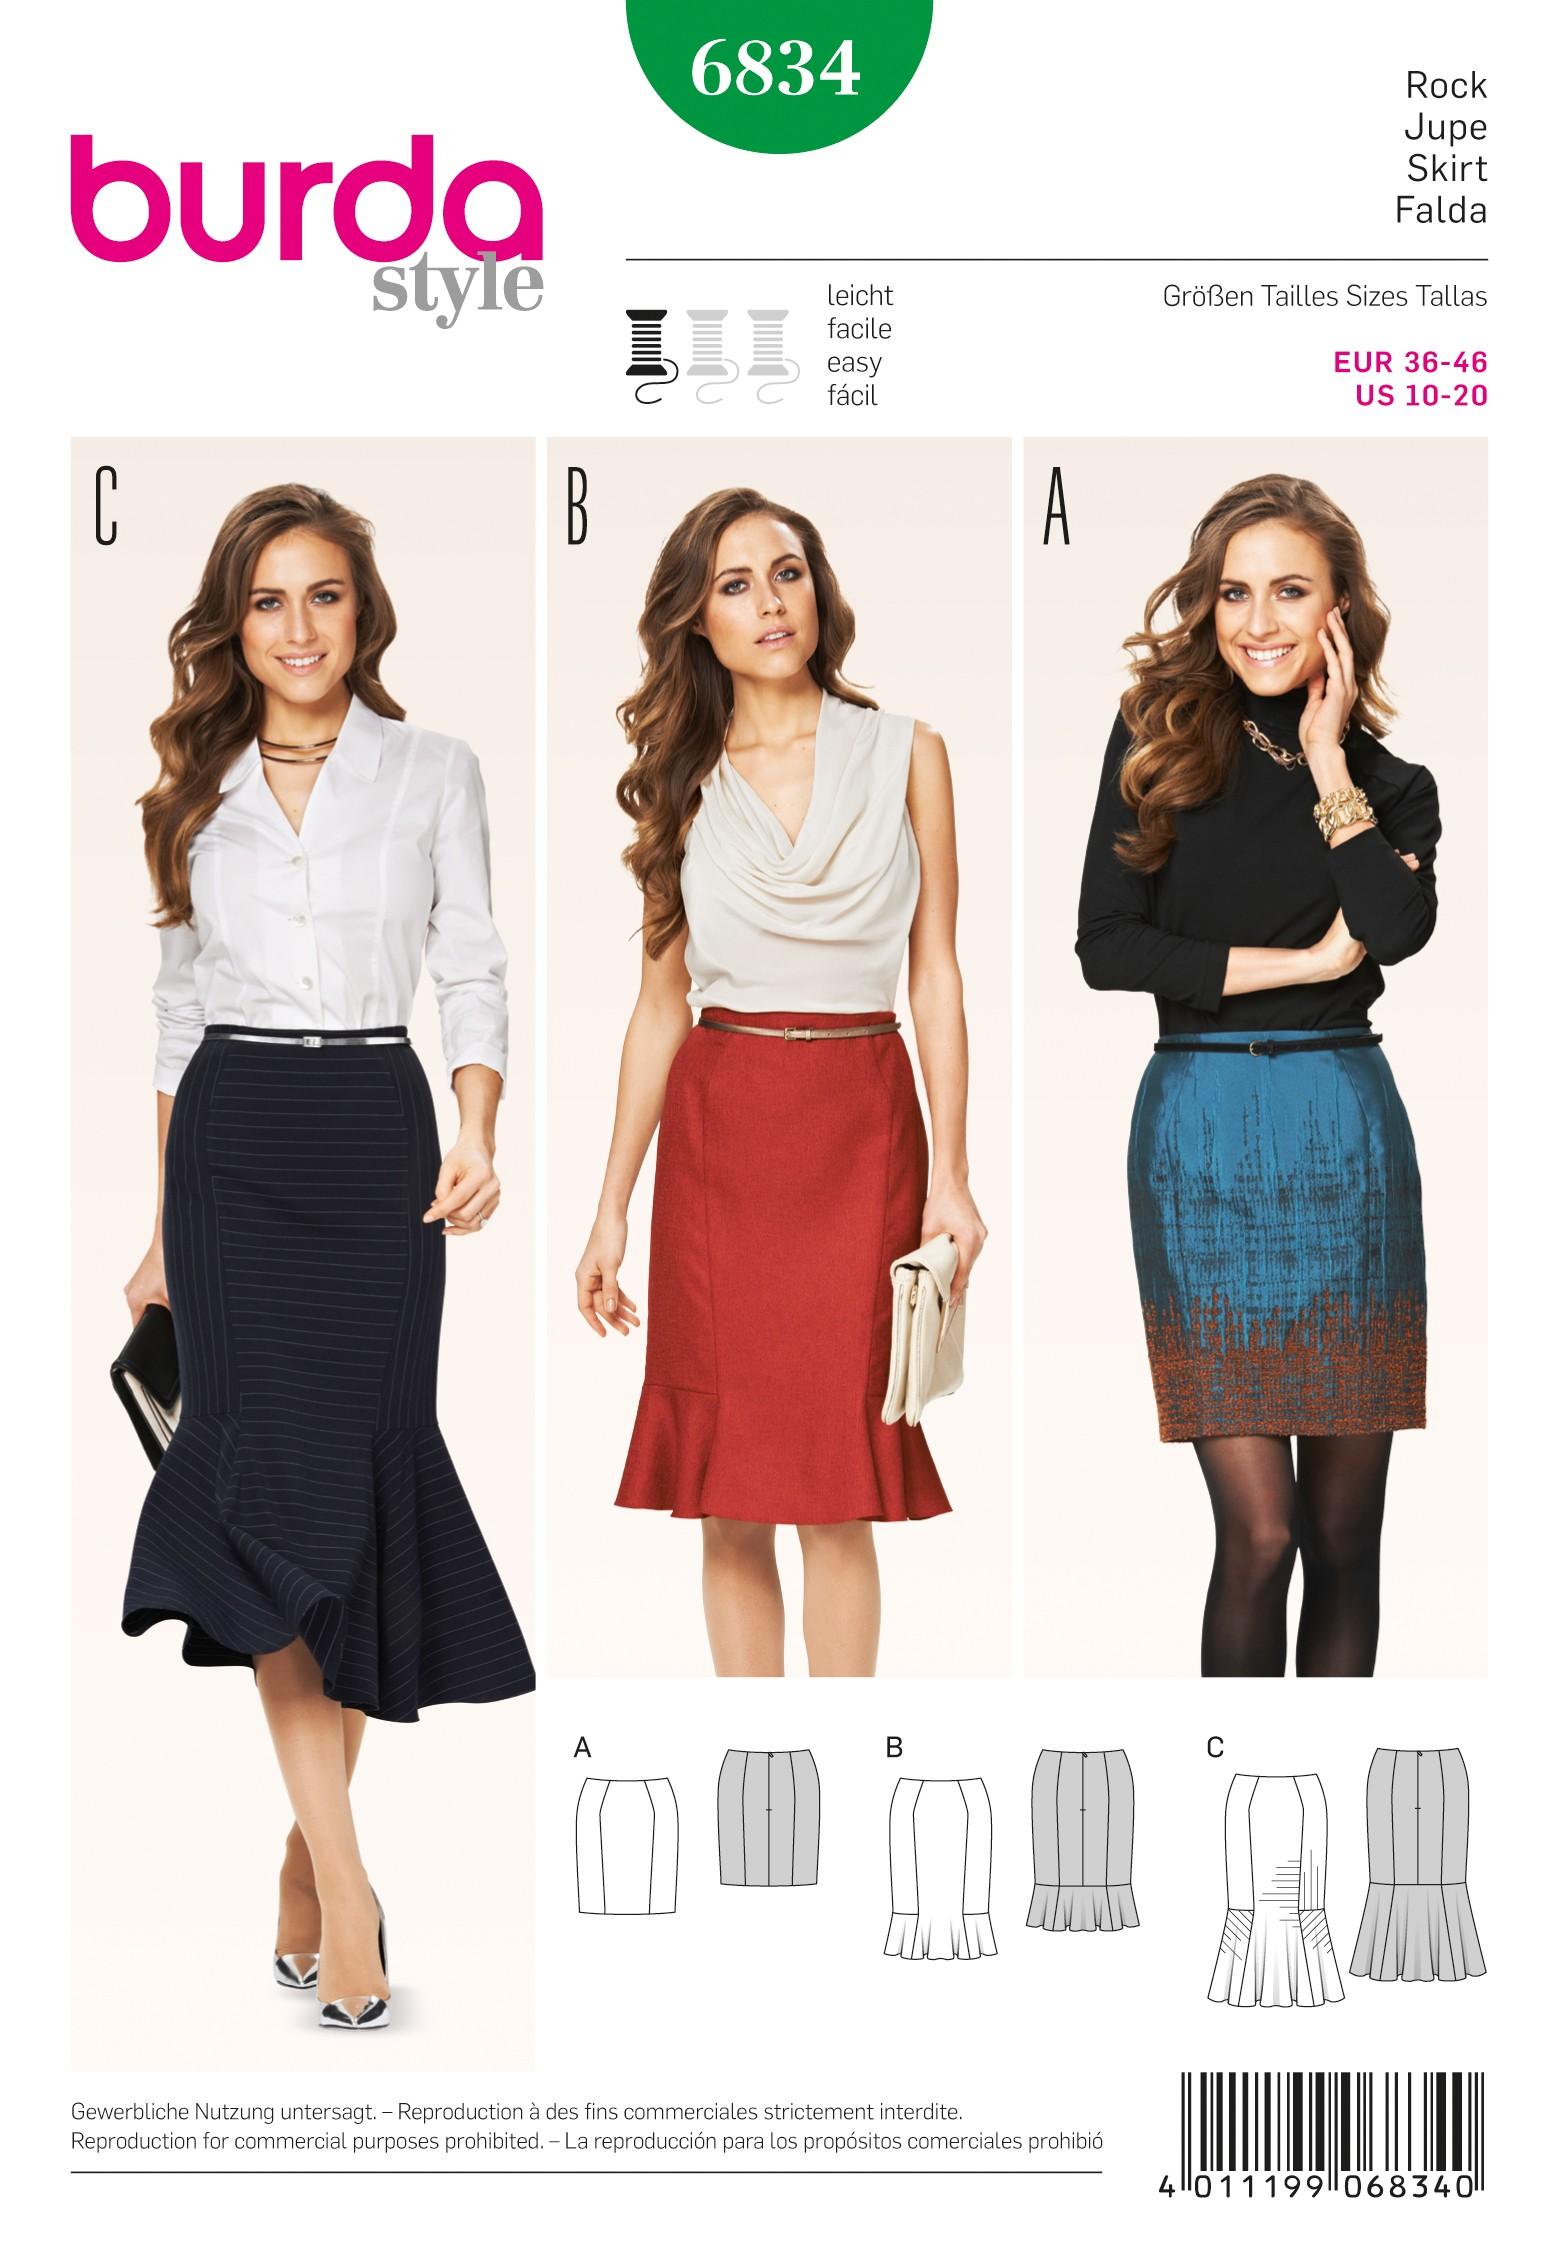 Burda Style Misses' Three Length Pencil Skirt Sewing Pattern 6834